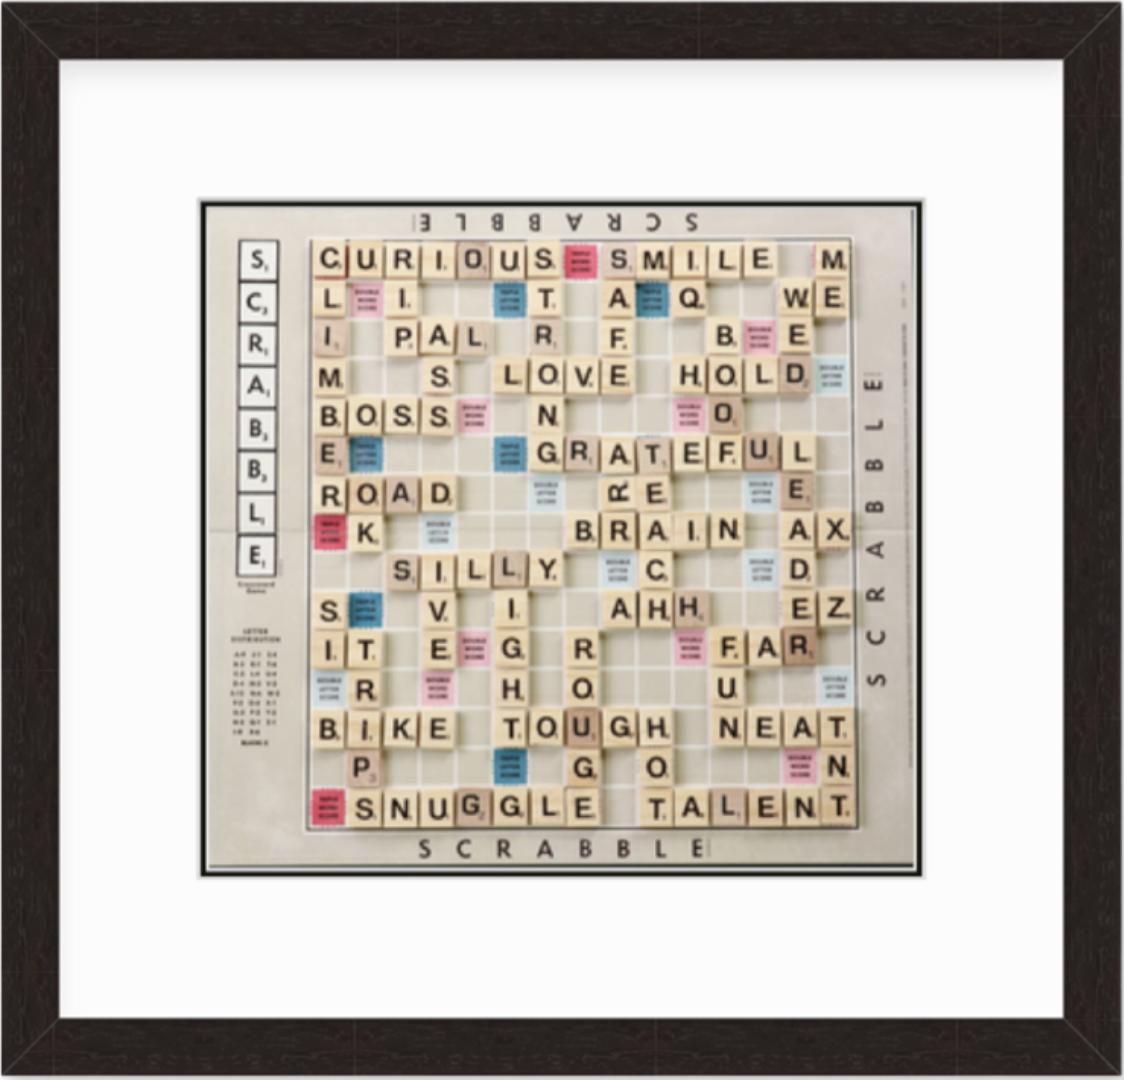 framed Scrabble game board in black walnut frame